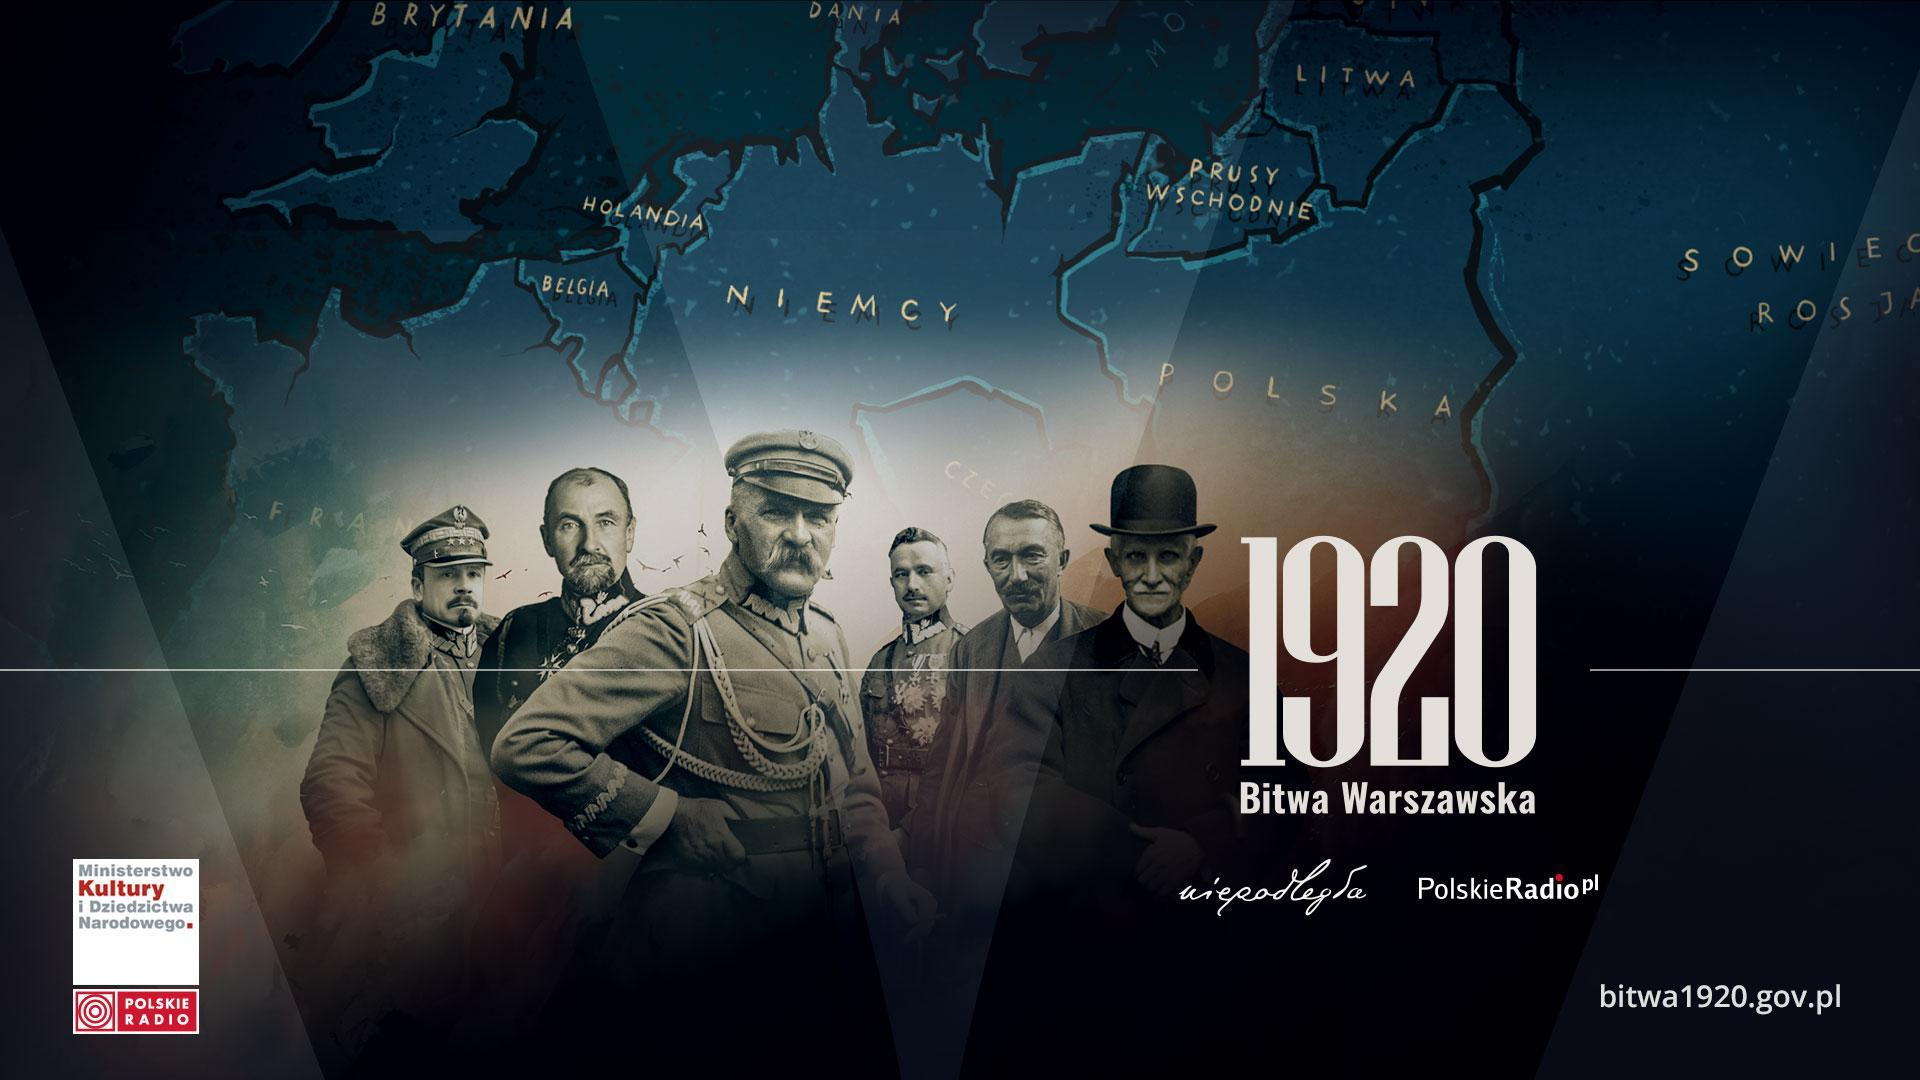 banner promujący portal bitwa1920.gov.pl